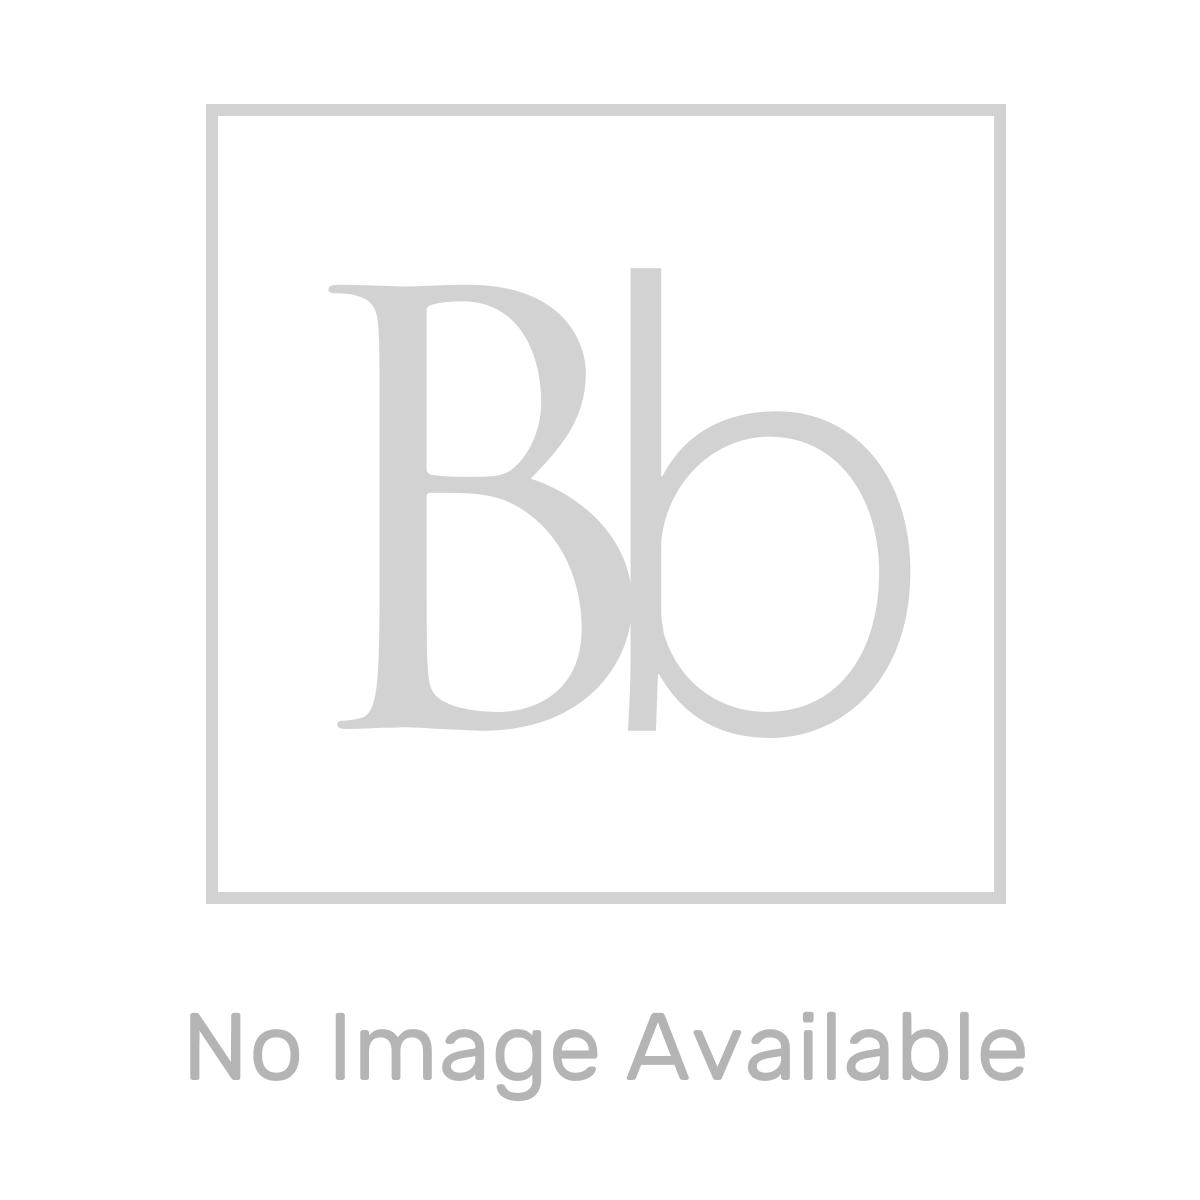 Premier Athena Driftwood 2 Drawer Floor Standing Vanity Unit 600mm Lifestyle